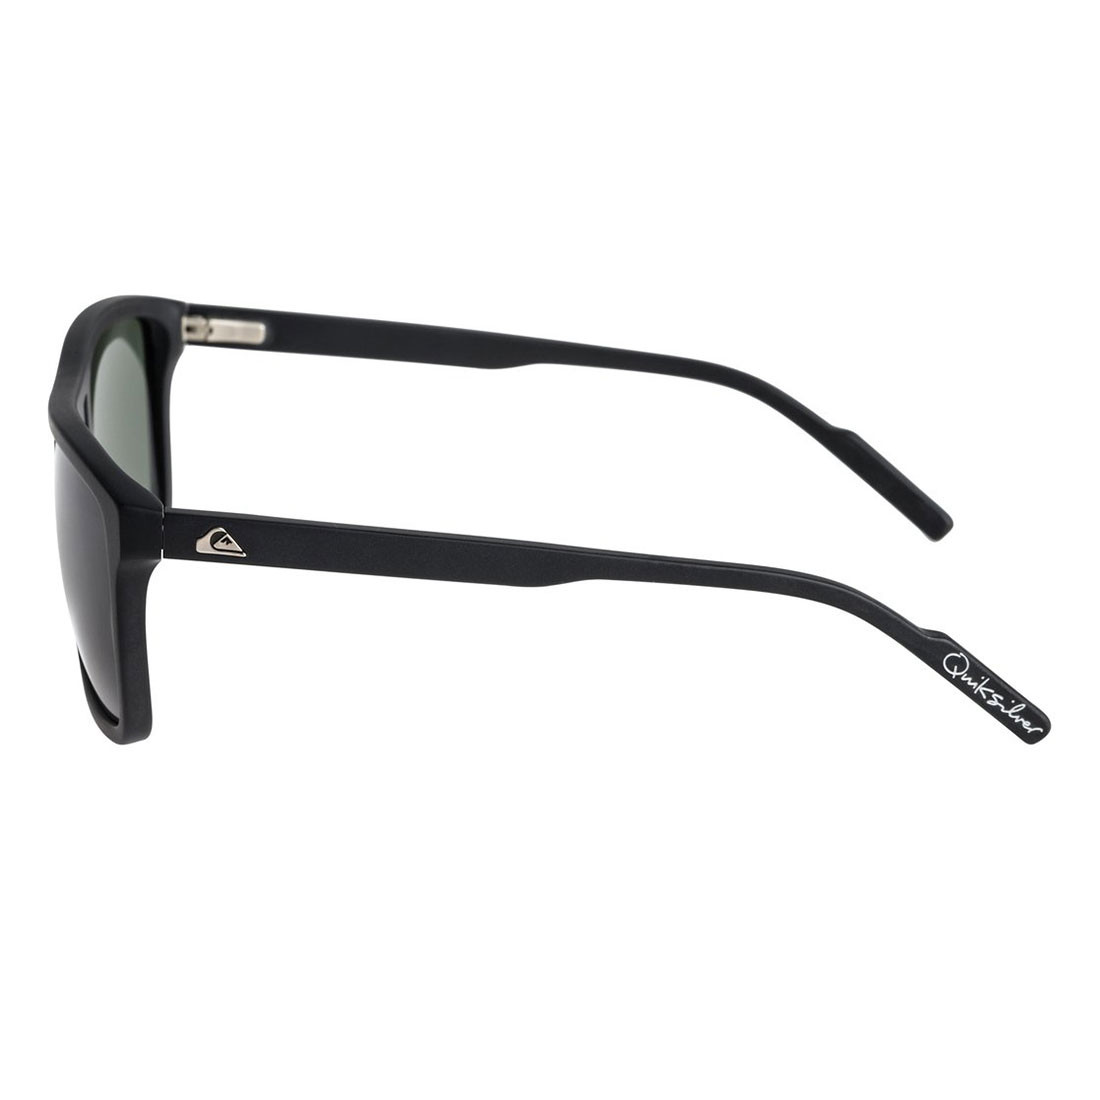 Slnečné okuliare Quiksilver Brigade matte black  2ef5b6ca1b0